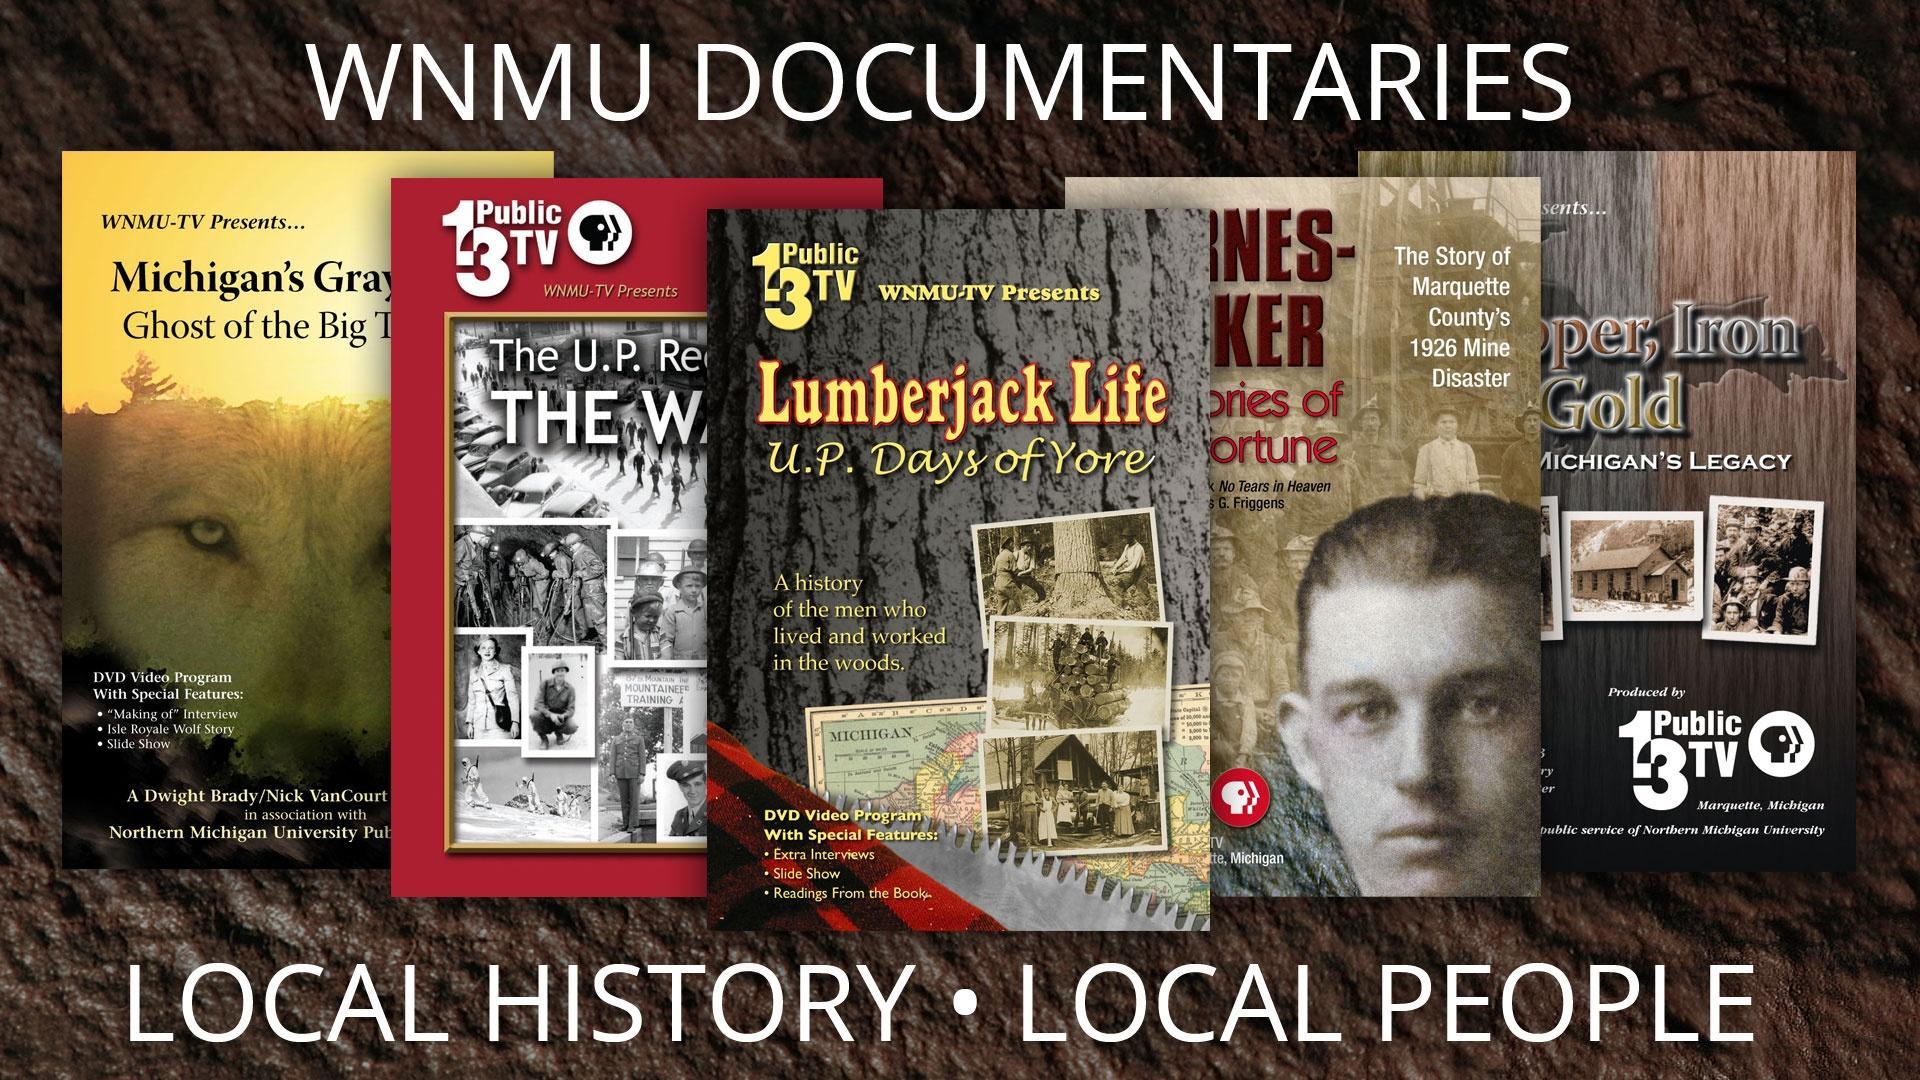 WNMU Documentaries DVD Covers